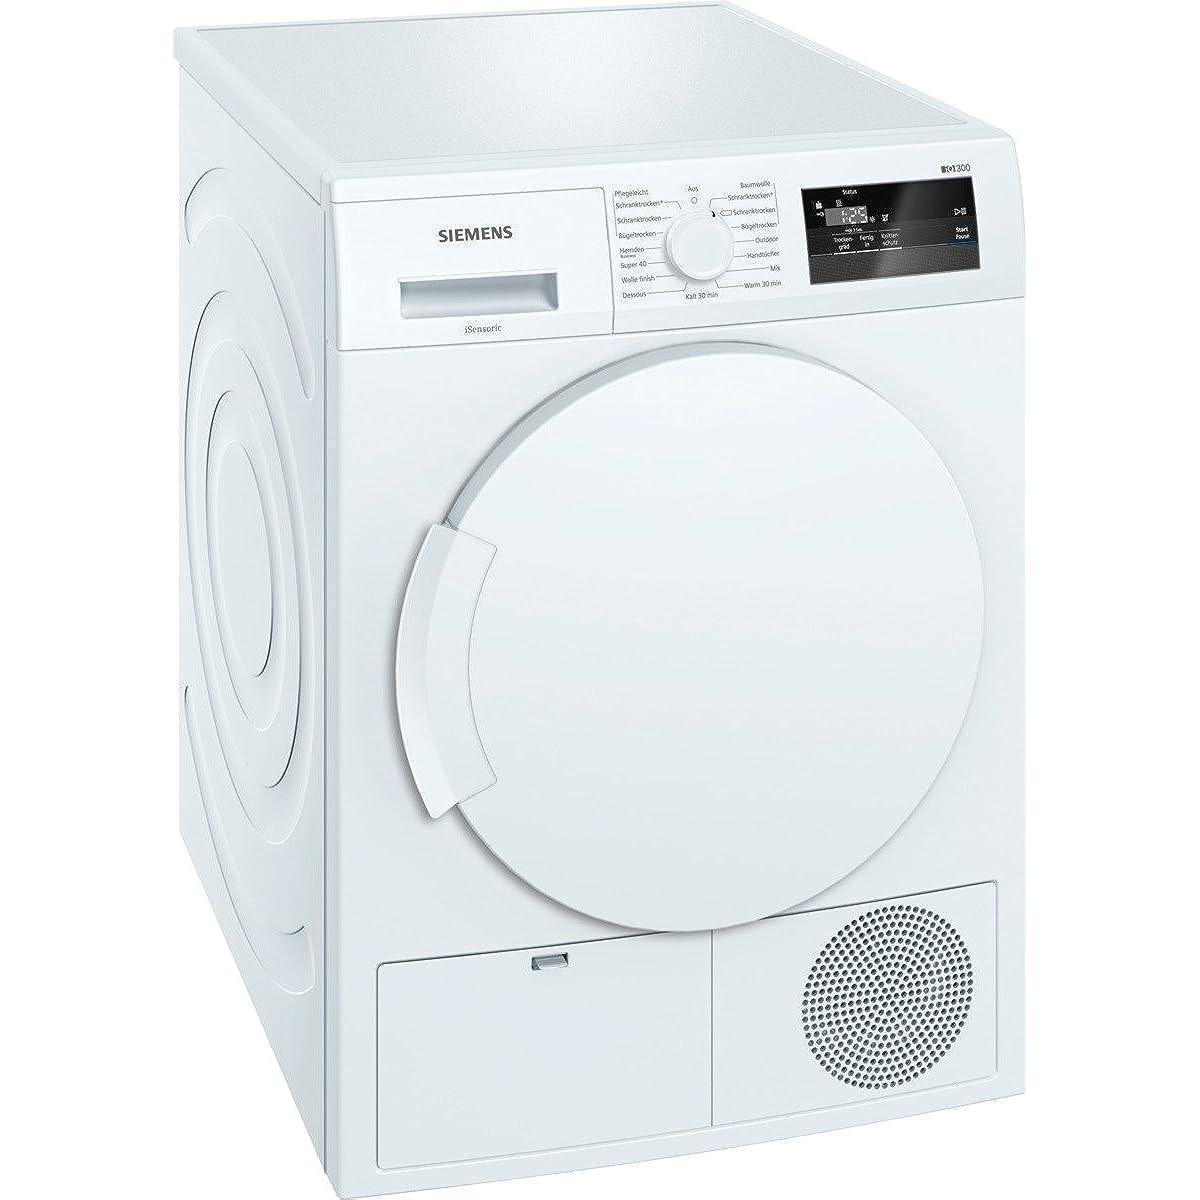 Siemens iQ700 WT46W261 iSensoric